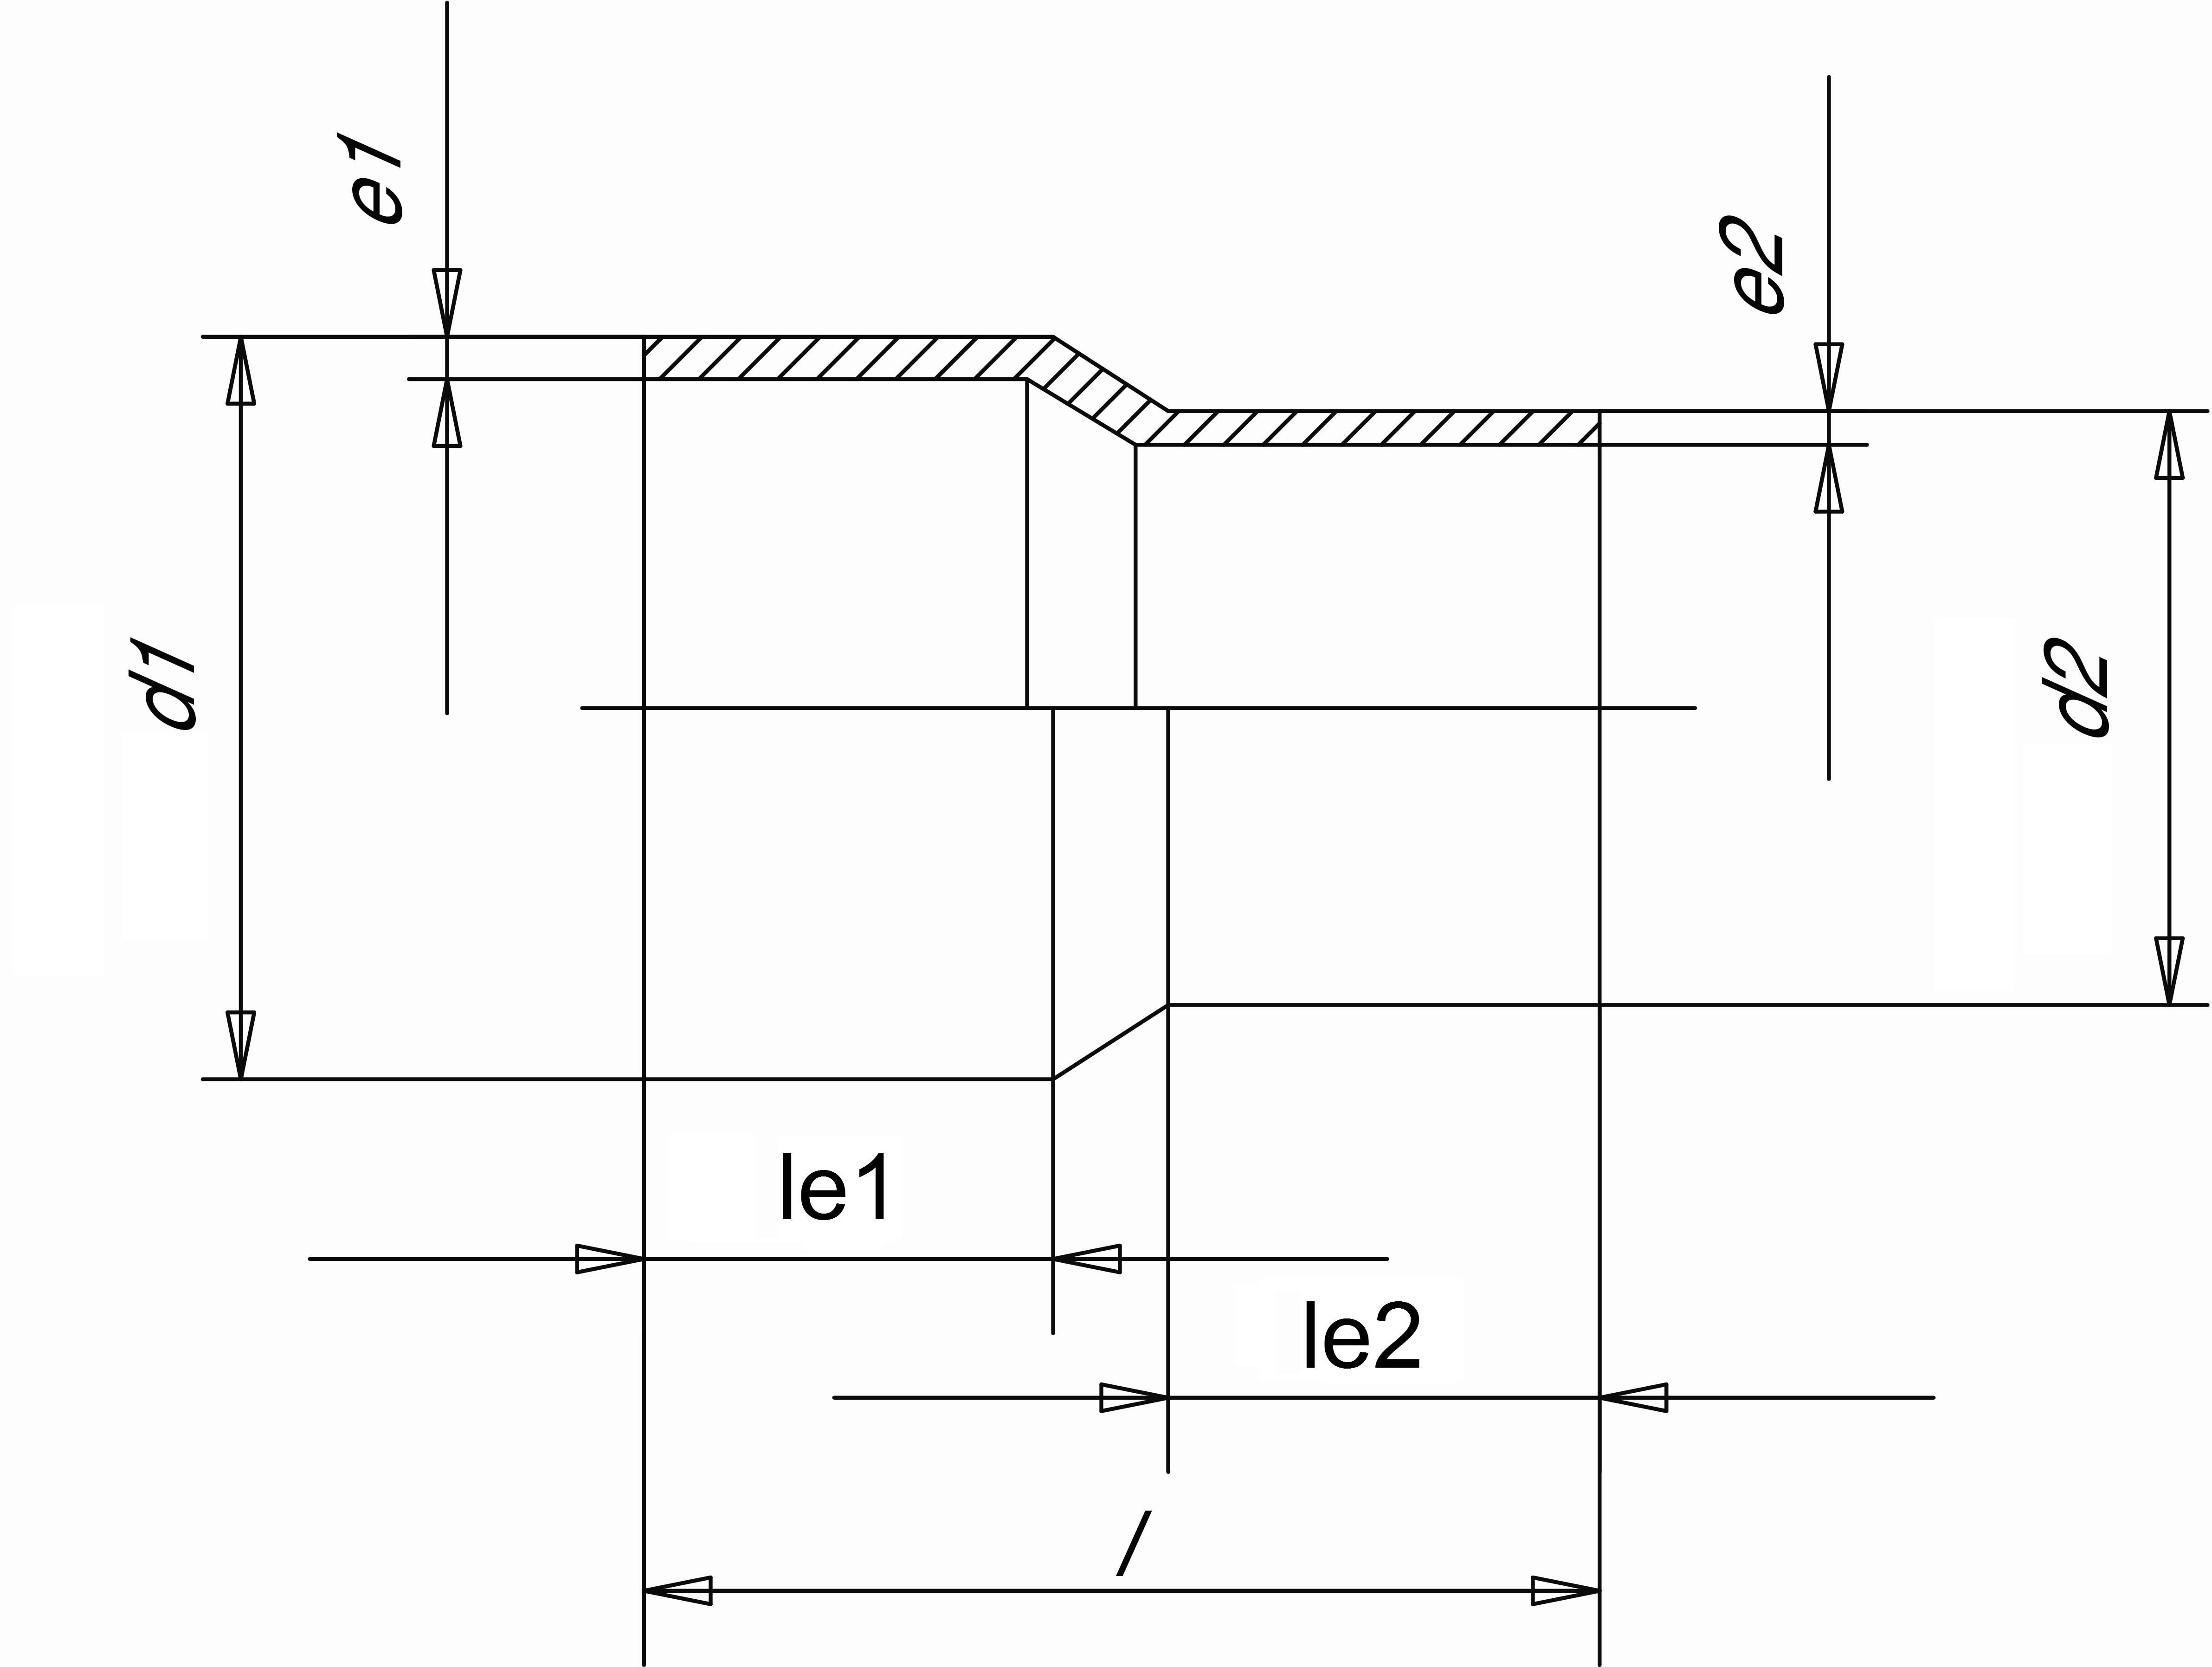 Муфта редукционная (Simona) SDR33 PN10 140x125